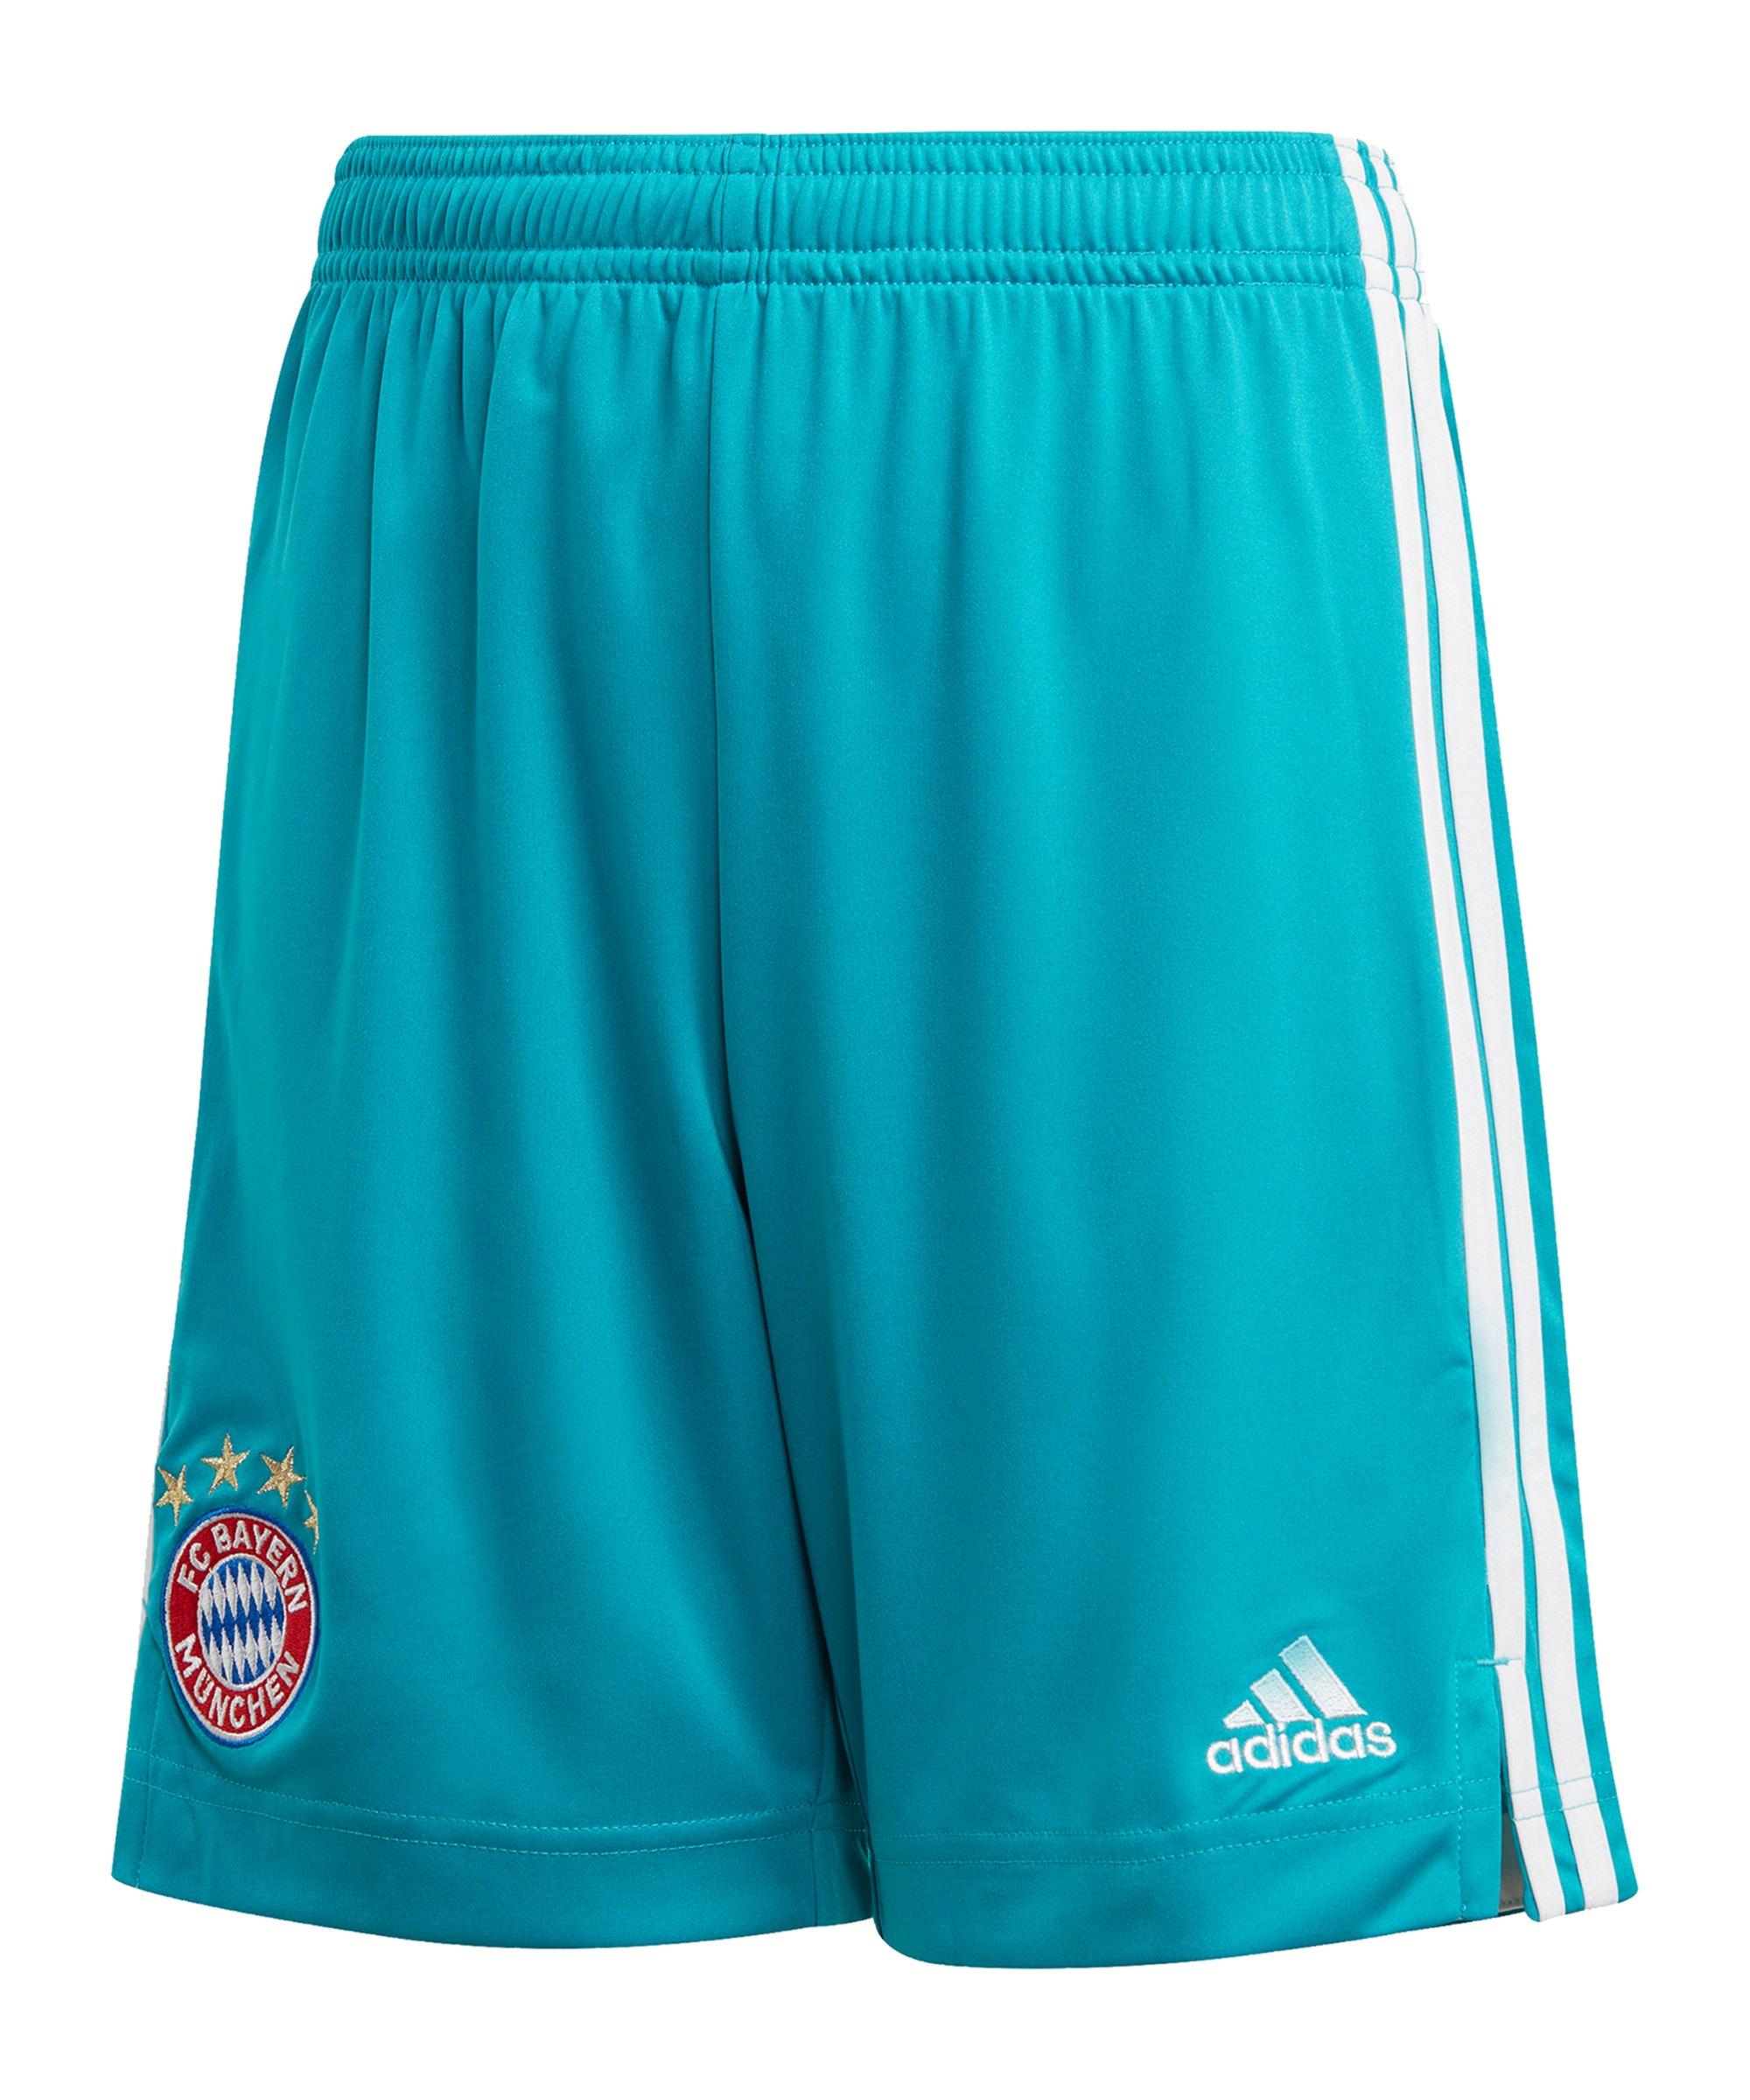 adidas FC Bayern München TW-Short 20/21 Kids Grün - gruen